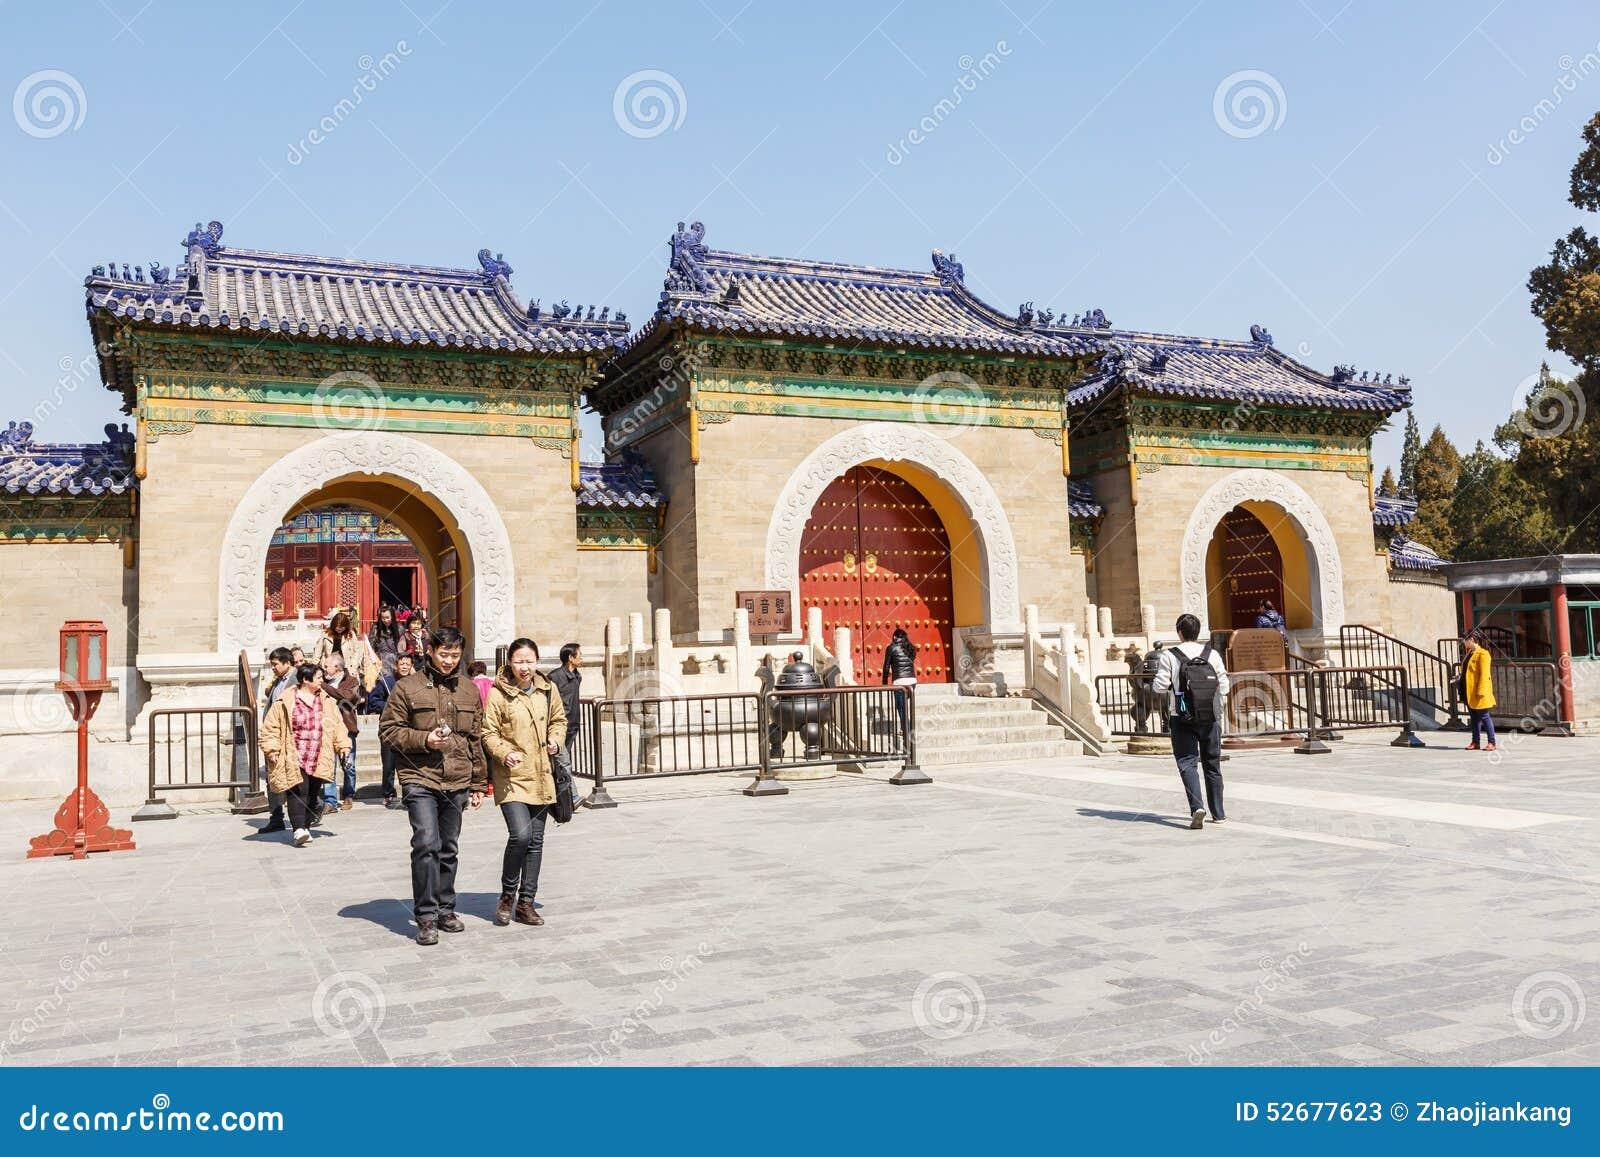 Famous Ancient Architecture world's most famous ancient architecture of the temple of heaven